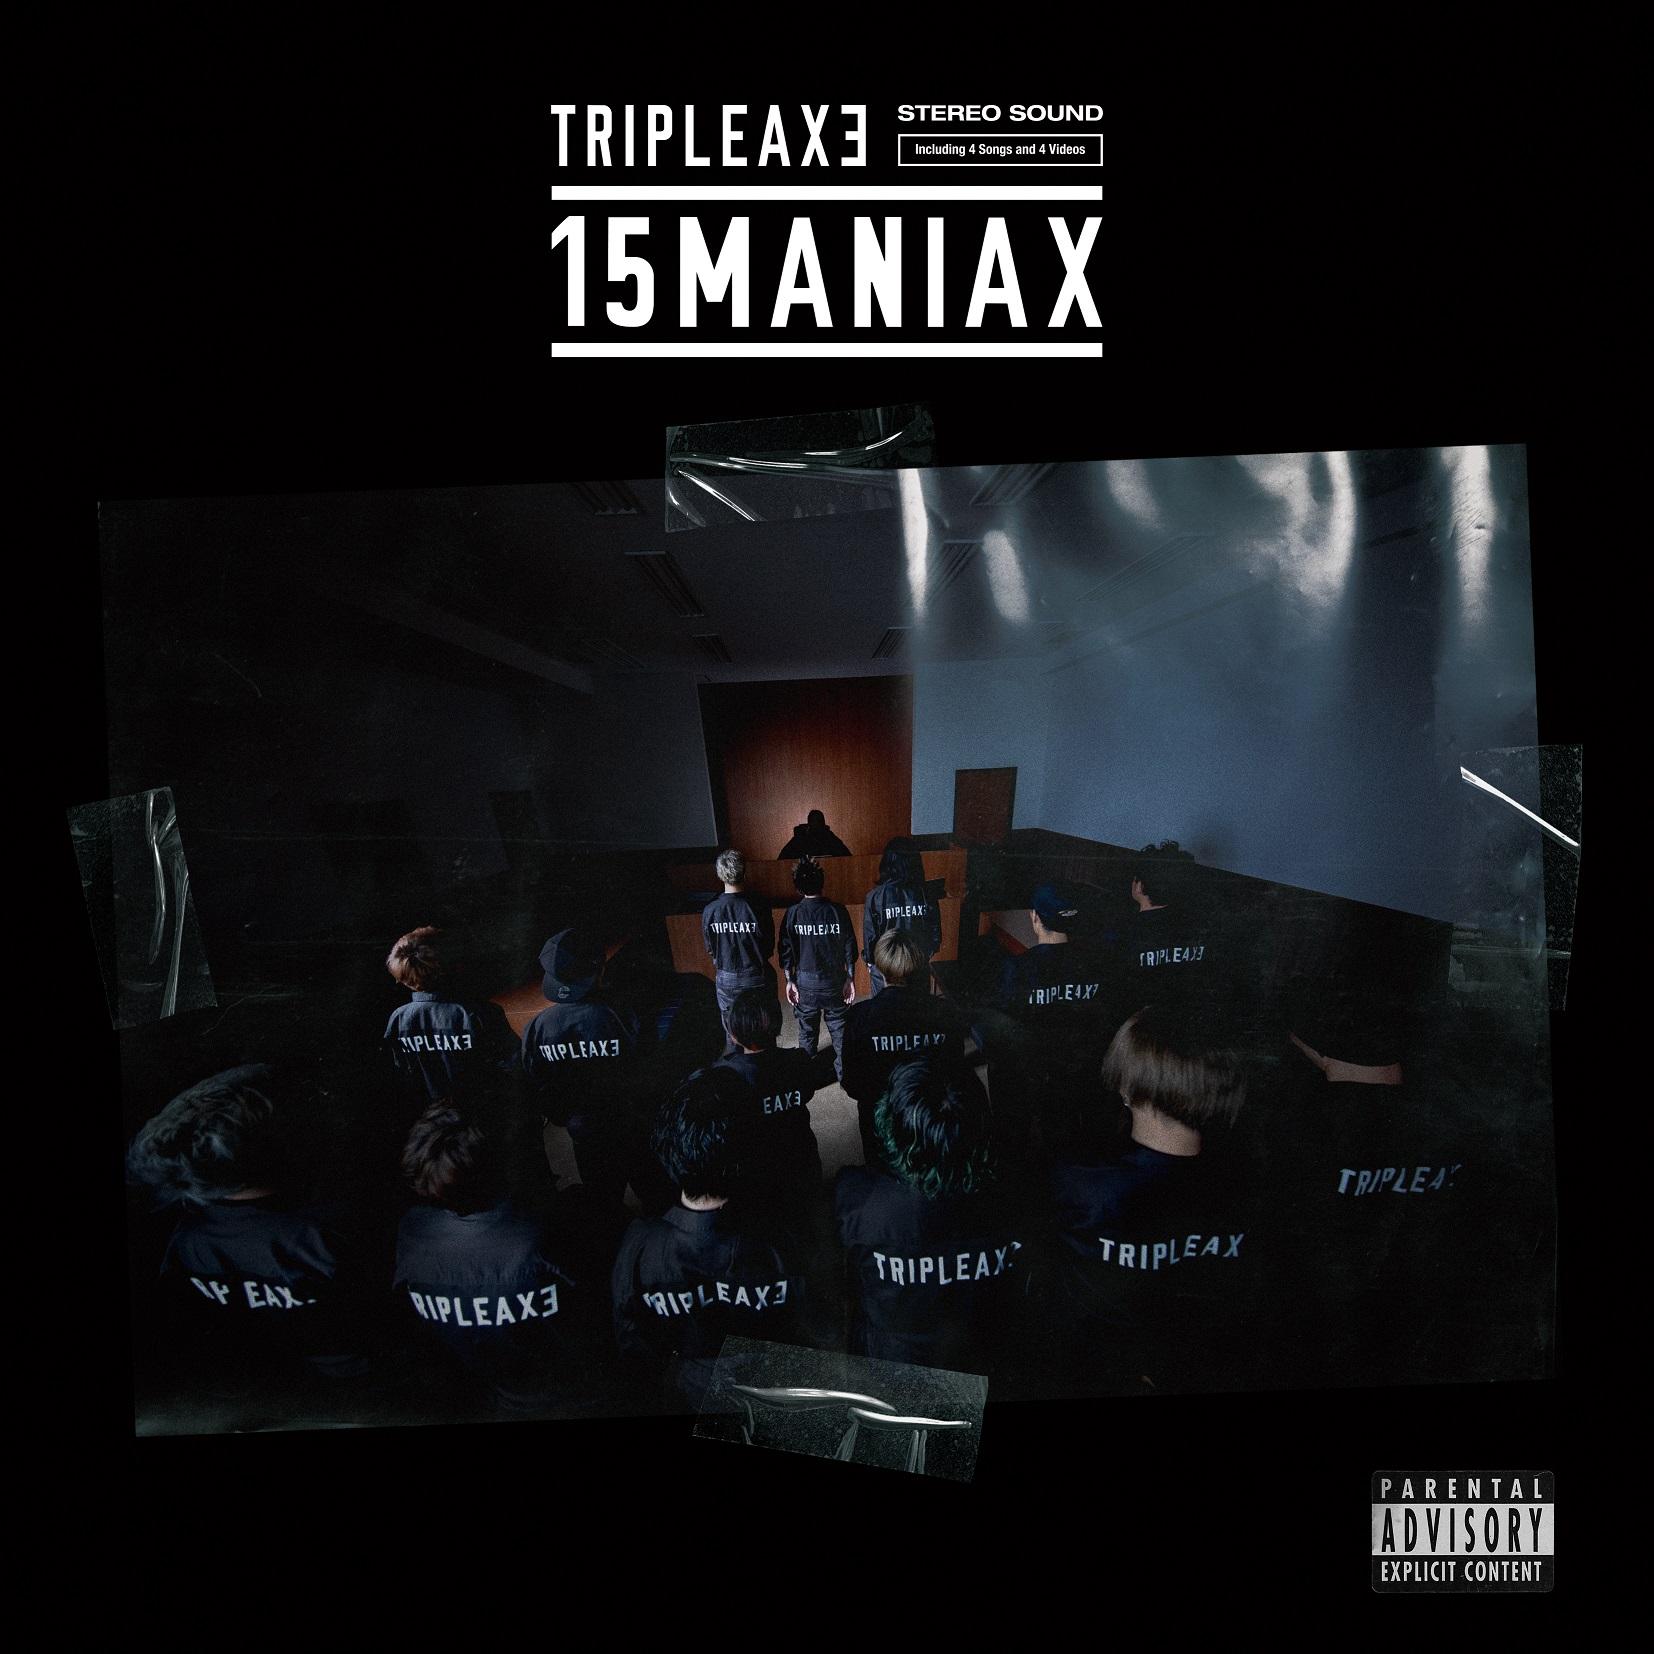 「15MANIAX」